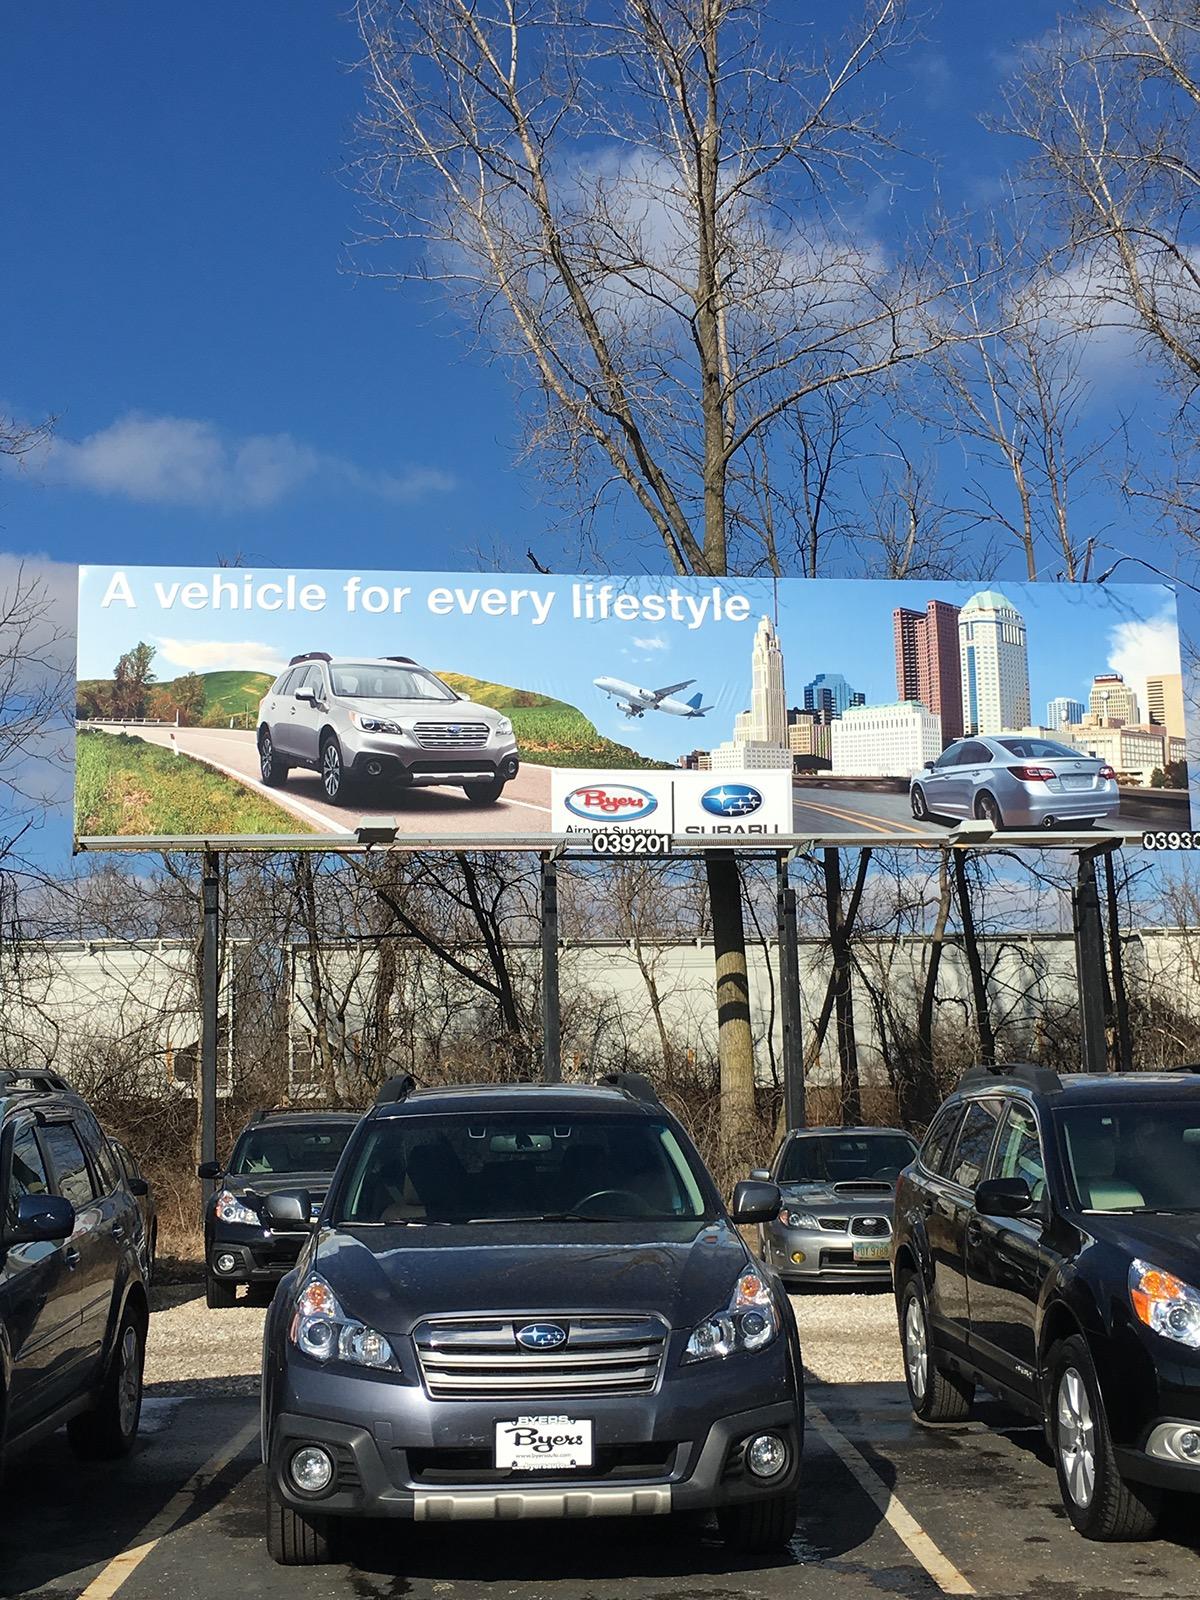 Byers Airport Subaru >> Byers Airport Subaru Outdoor Advertising On Behance